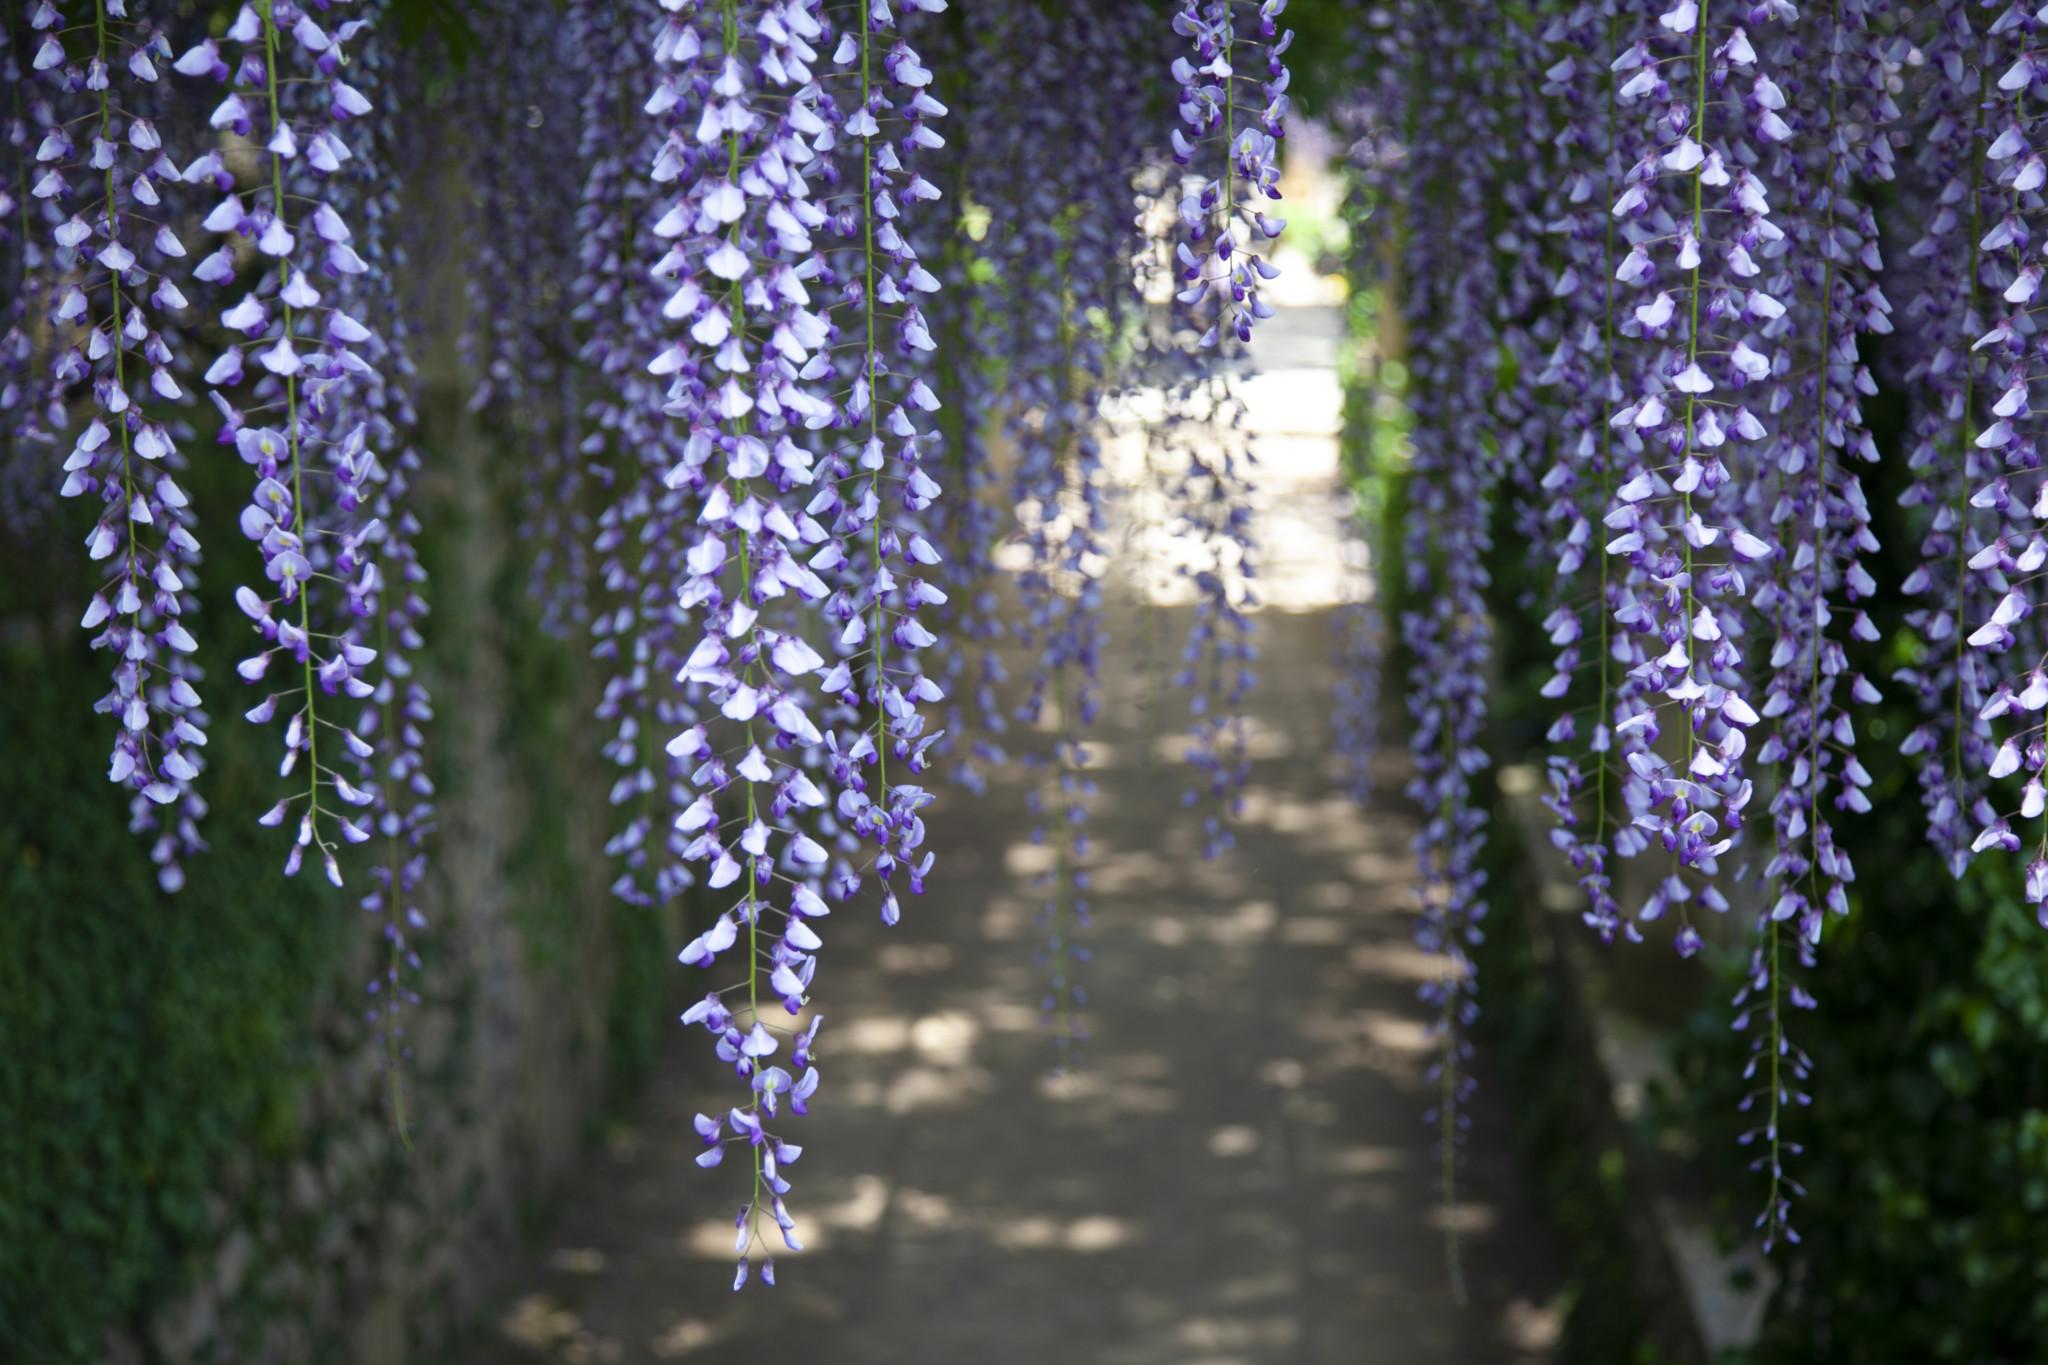 london wisteria company